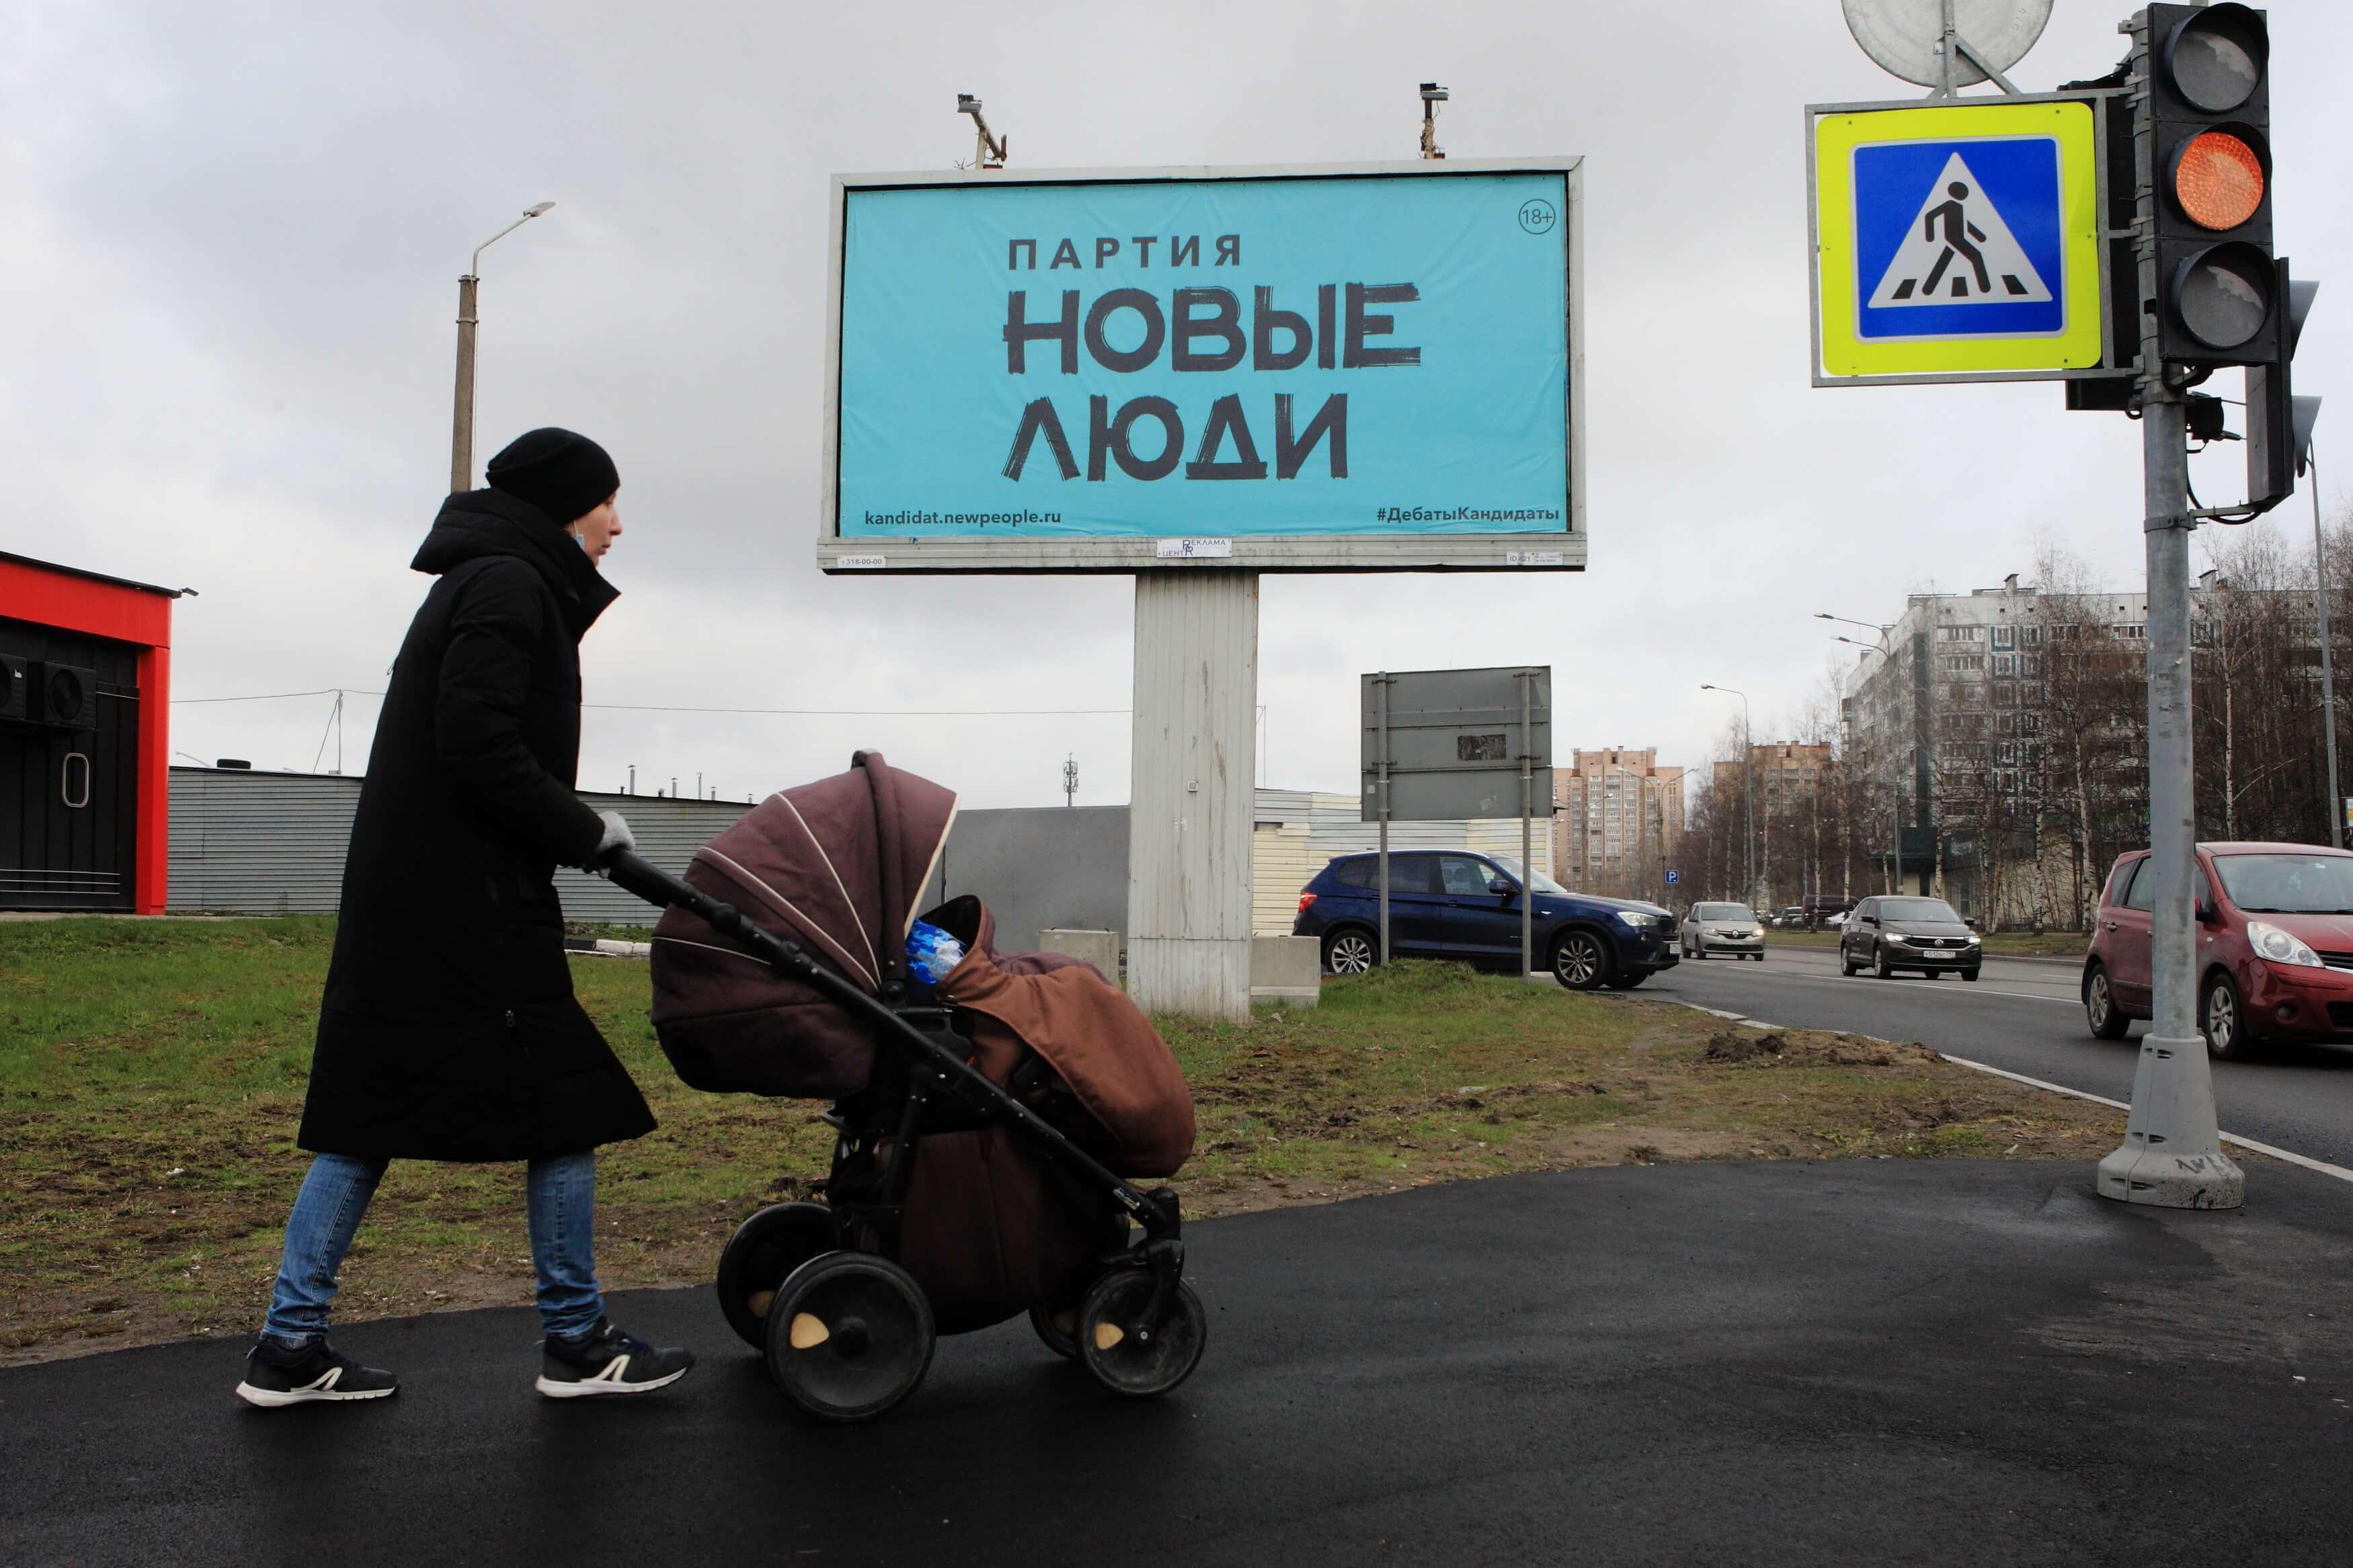 Zamir Usmanov / Global Look Press